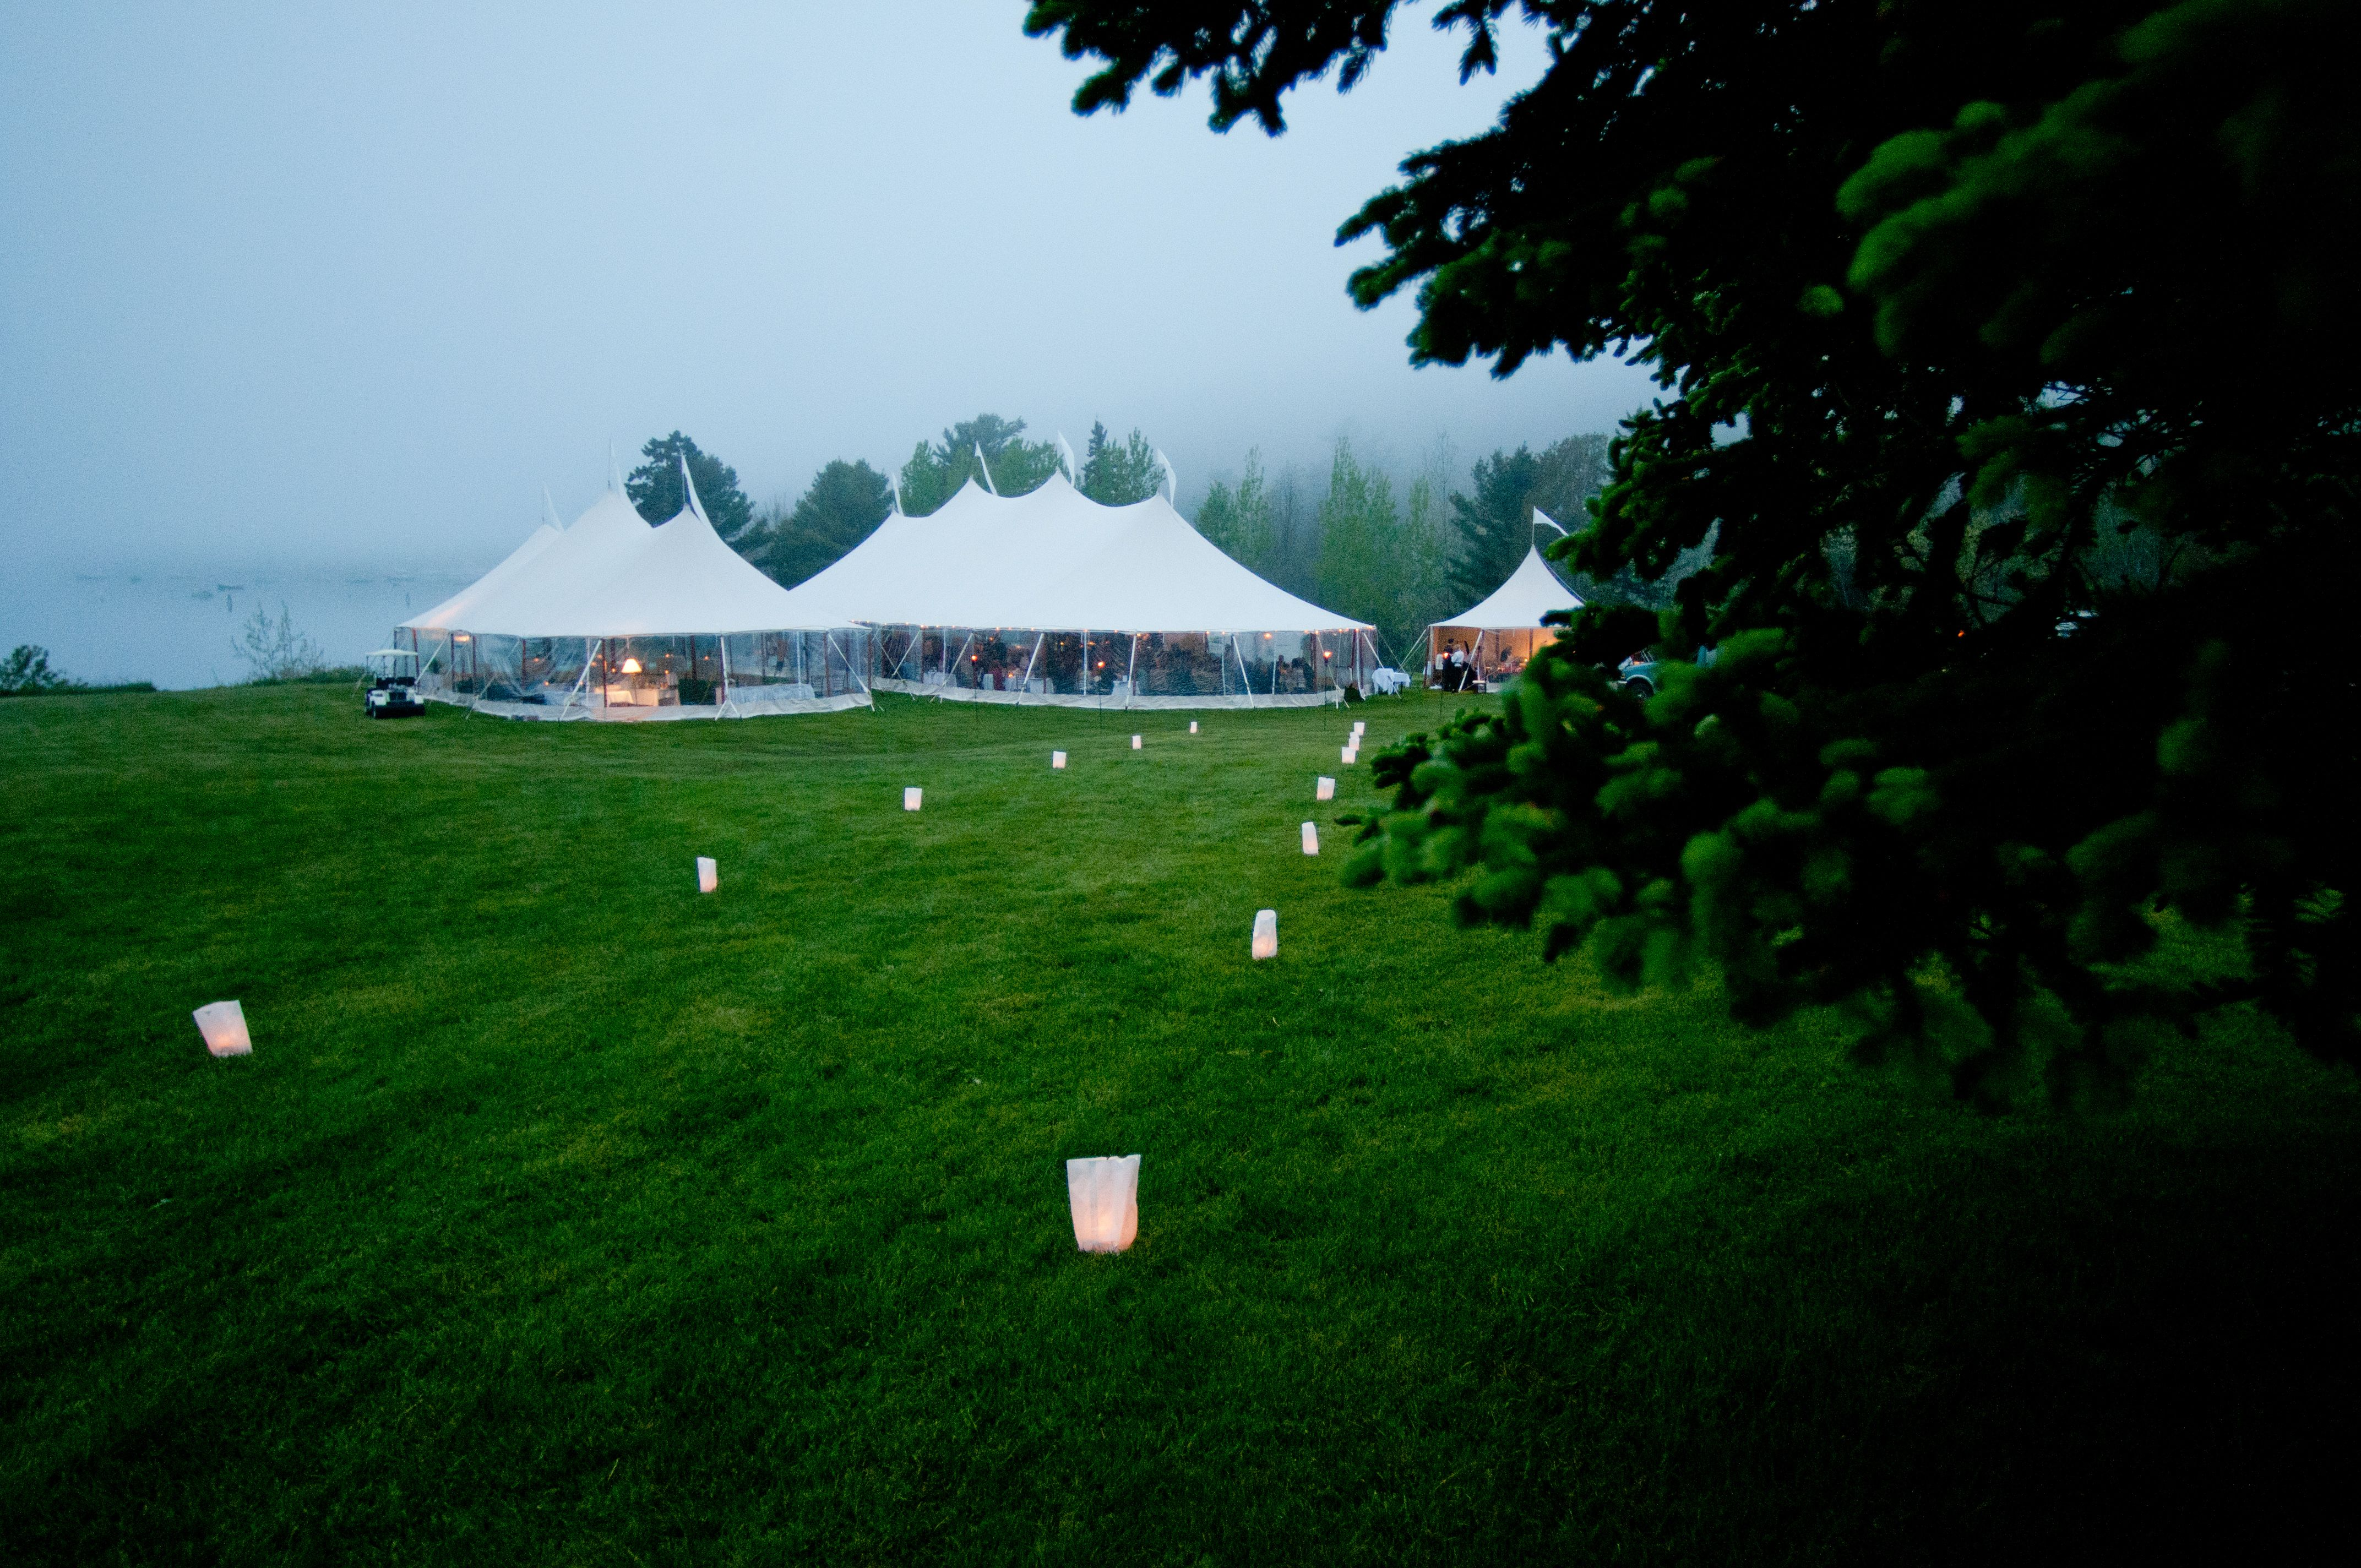 Tents at night   Maine wedding locations, England wedding ...